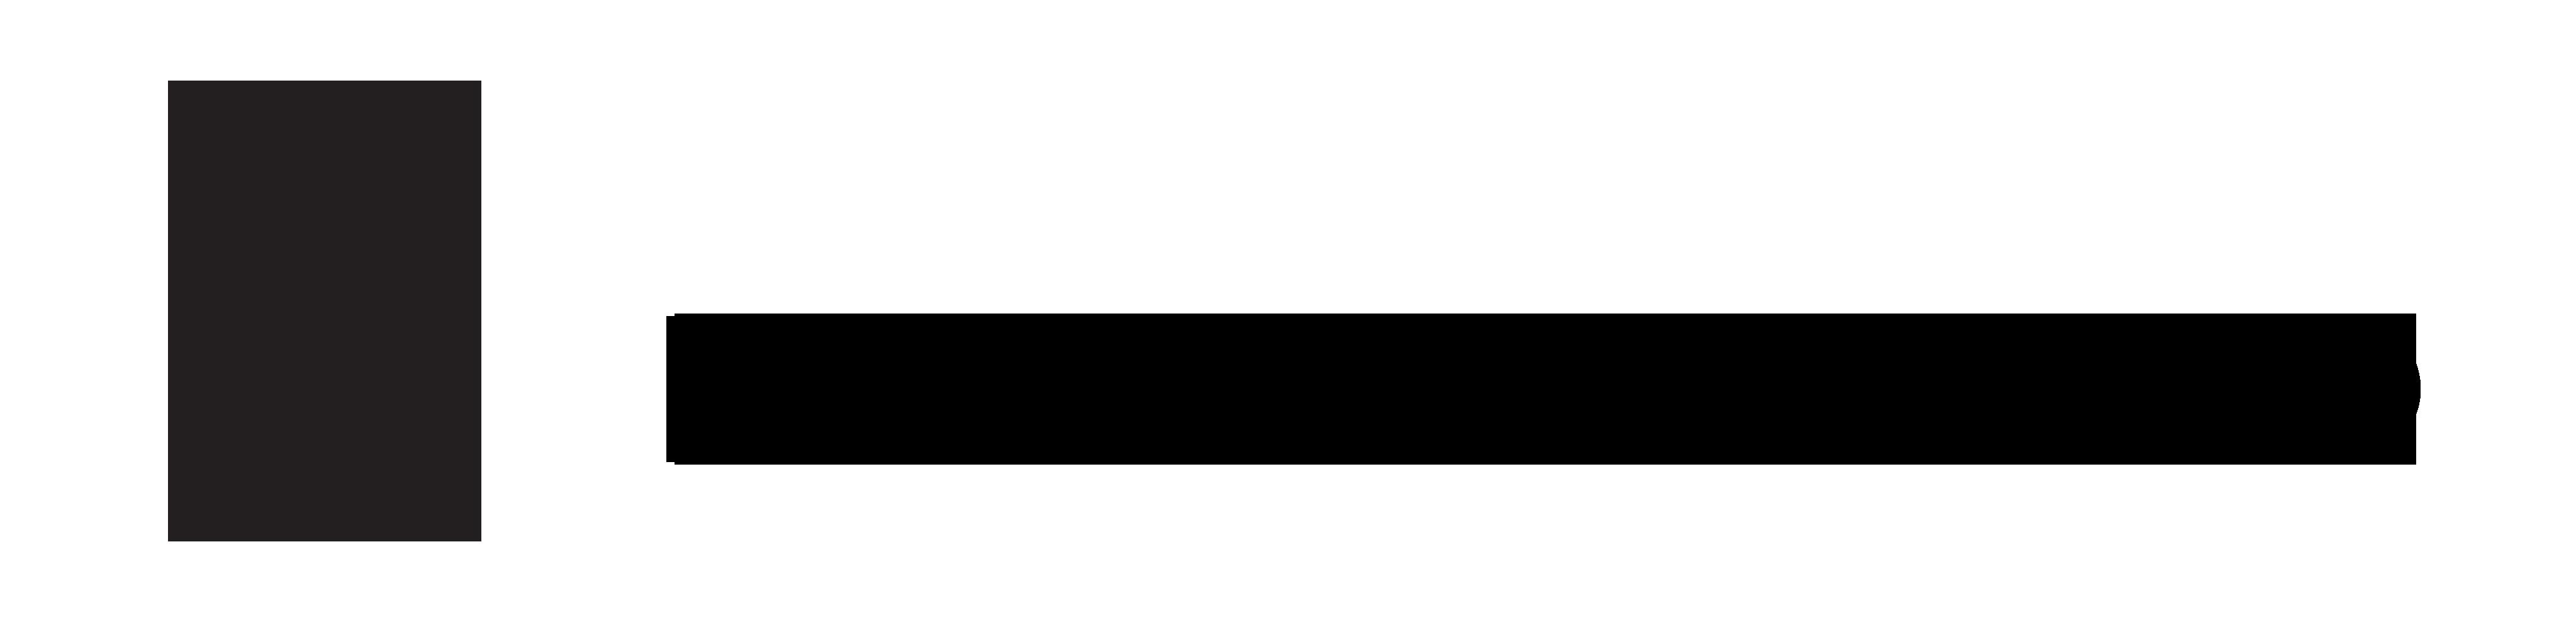 Next Steps logo